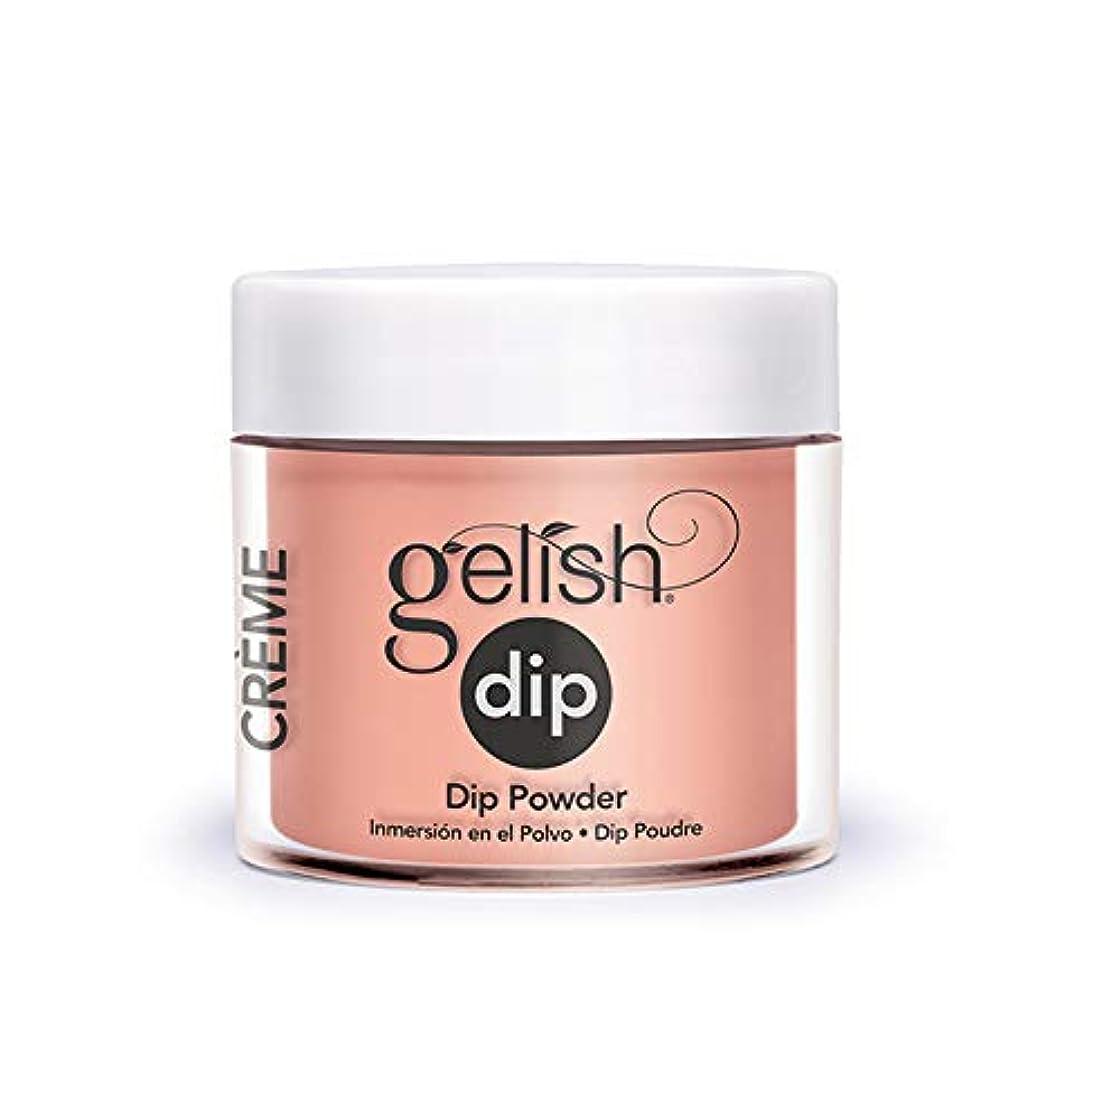 Harmony Gelish - Acrylic Dip Powder - I'm Brighter Than You - 23g / 0.8oz